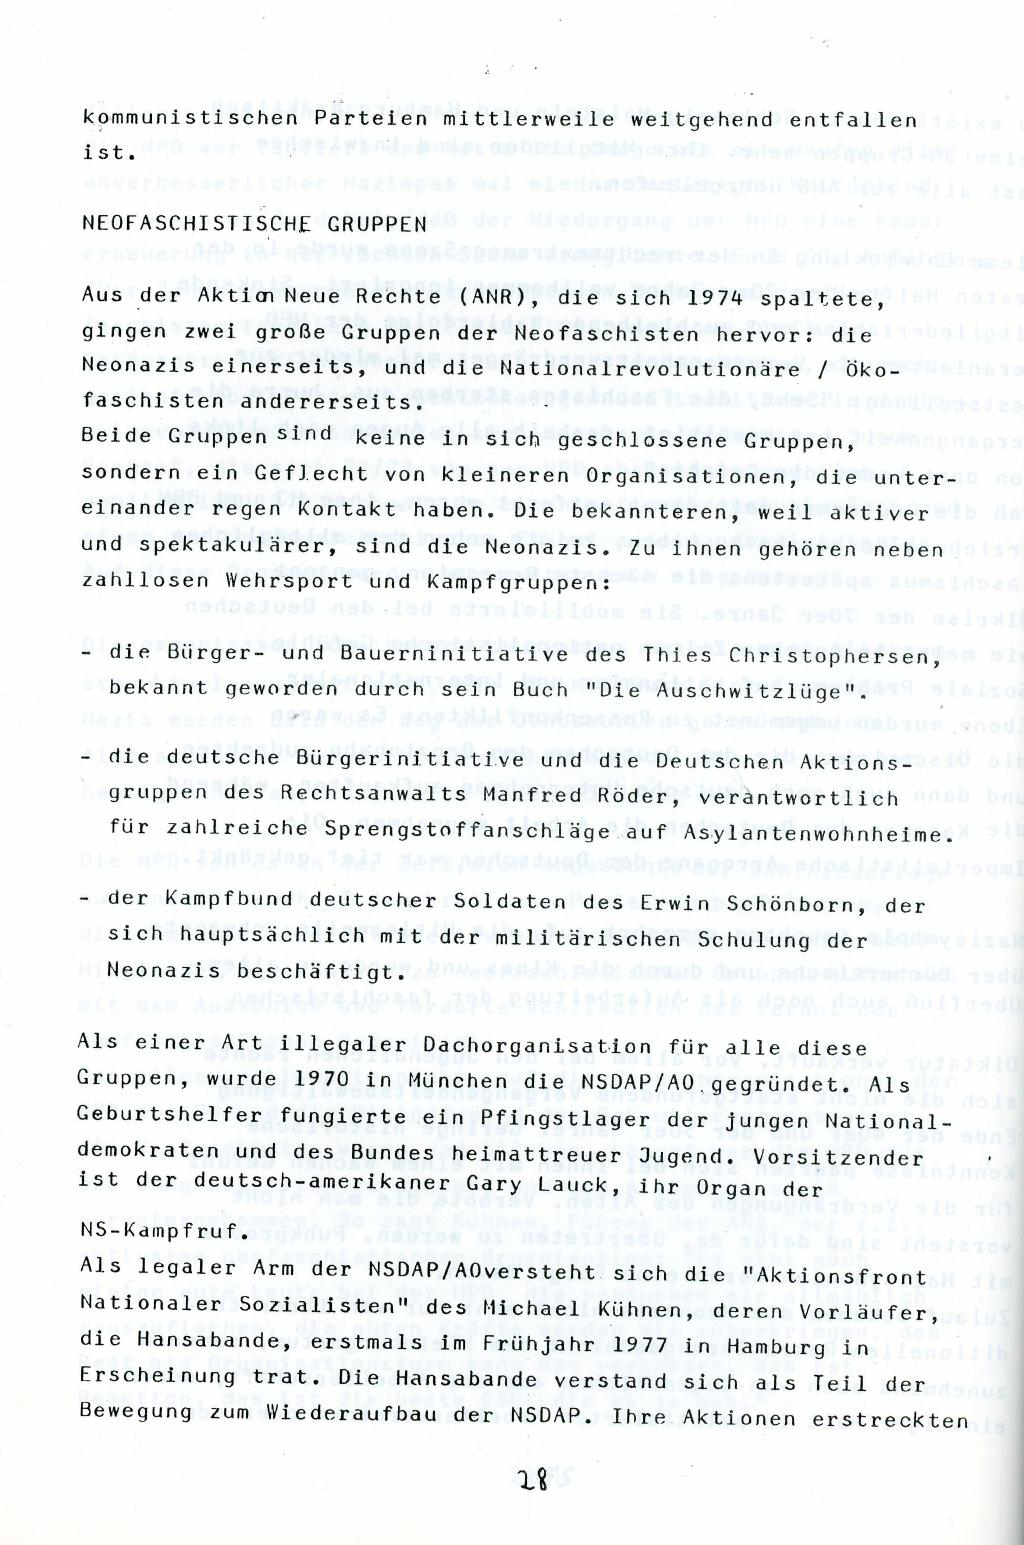 Berlin_1983_Autonome_Gruppen_Faschismus_im_Kapitalismus_28